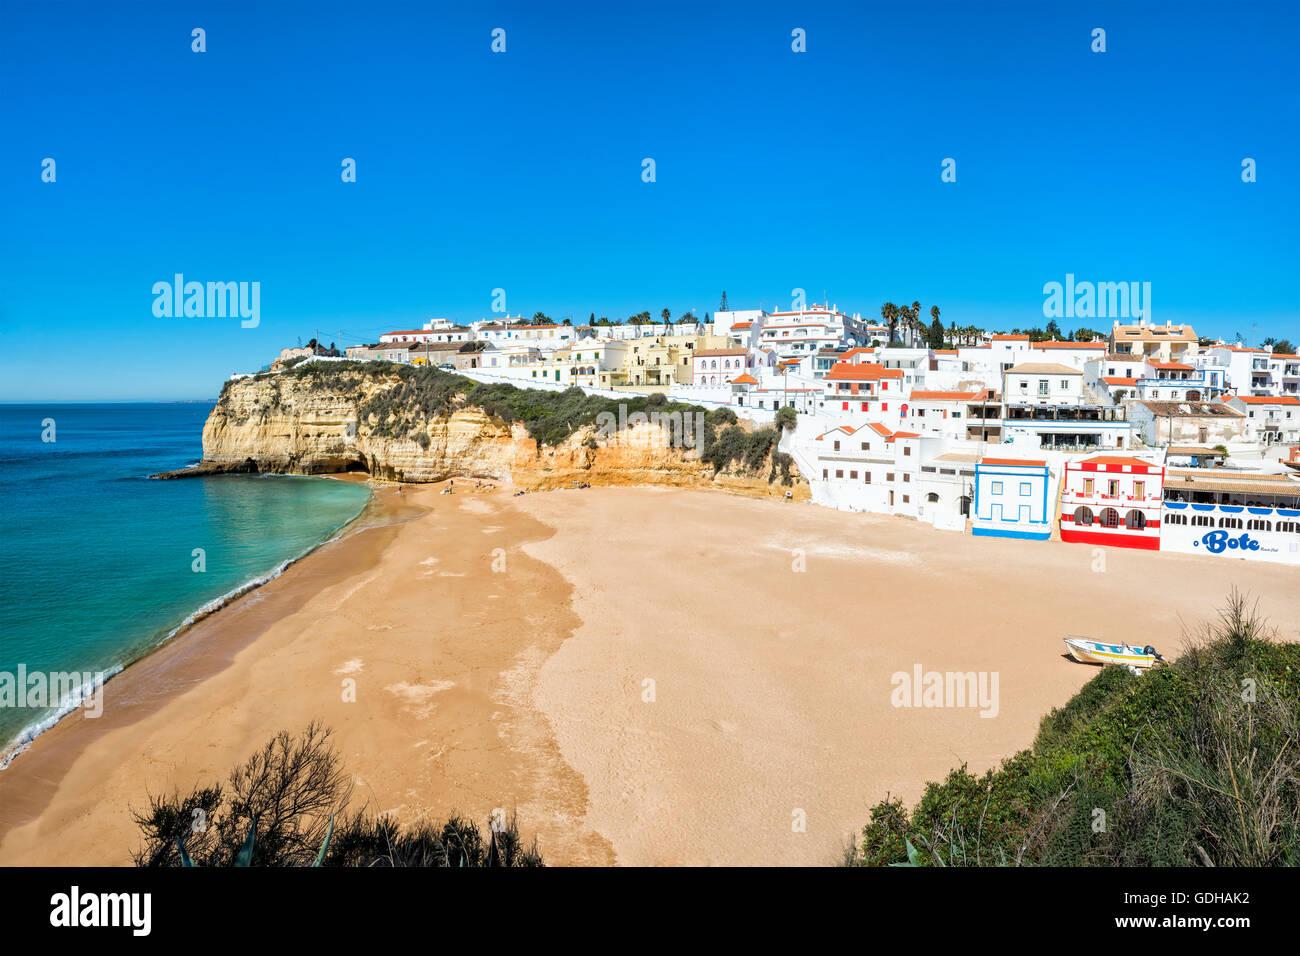 Carvoeiro and Beach, Algarve, Portugal Stock Photo